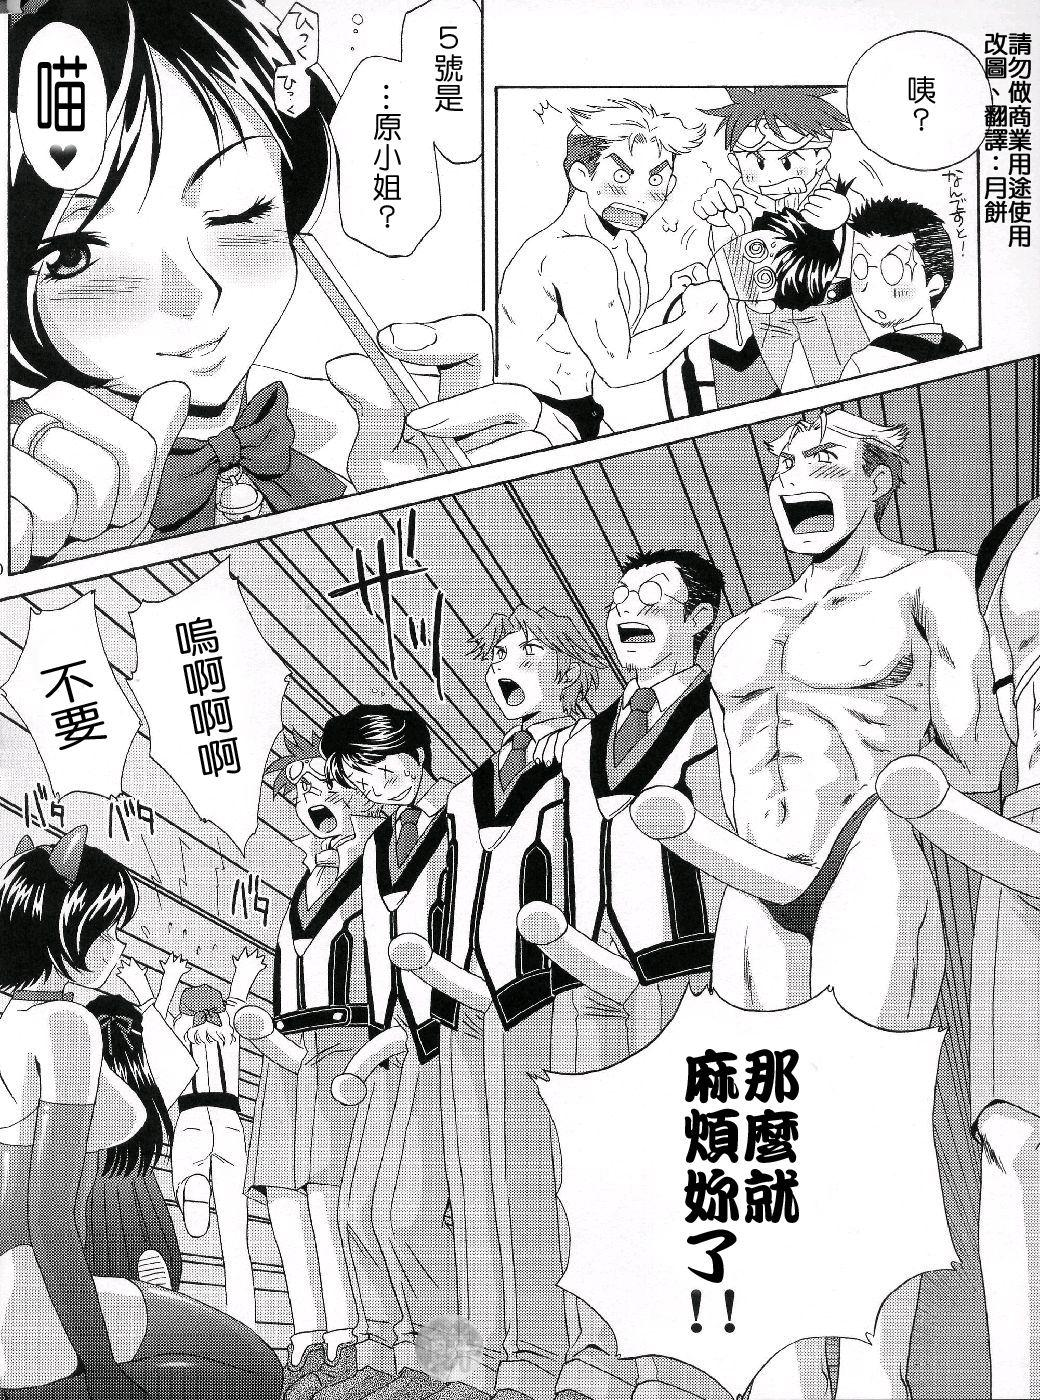 Hakudakueki Gensou Gang Bang March 8